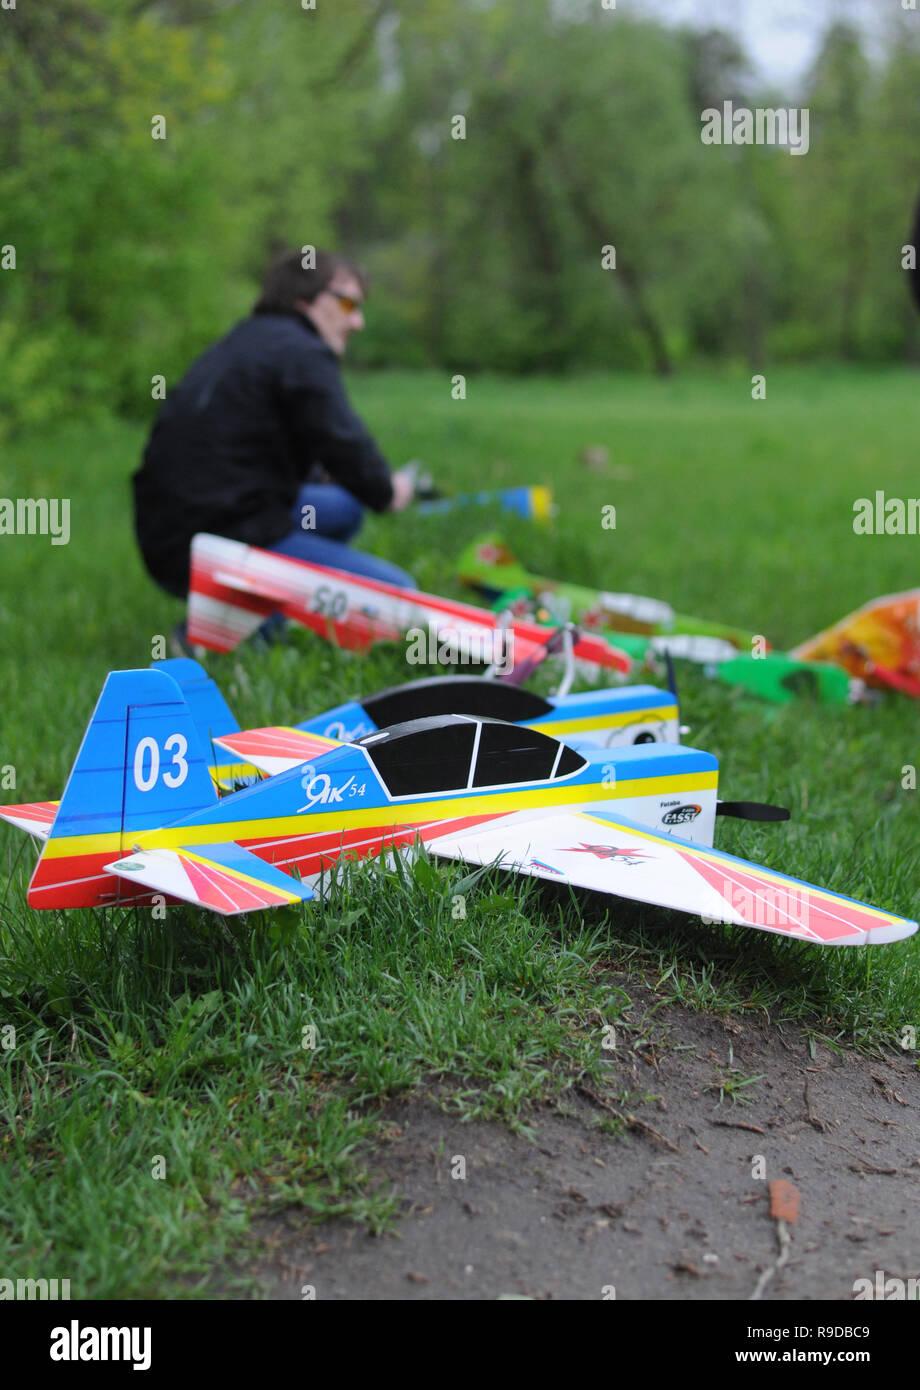 Kovrov, Russia  19 May 2015  Flights on airplane models in football